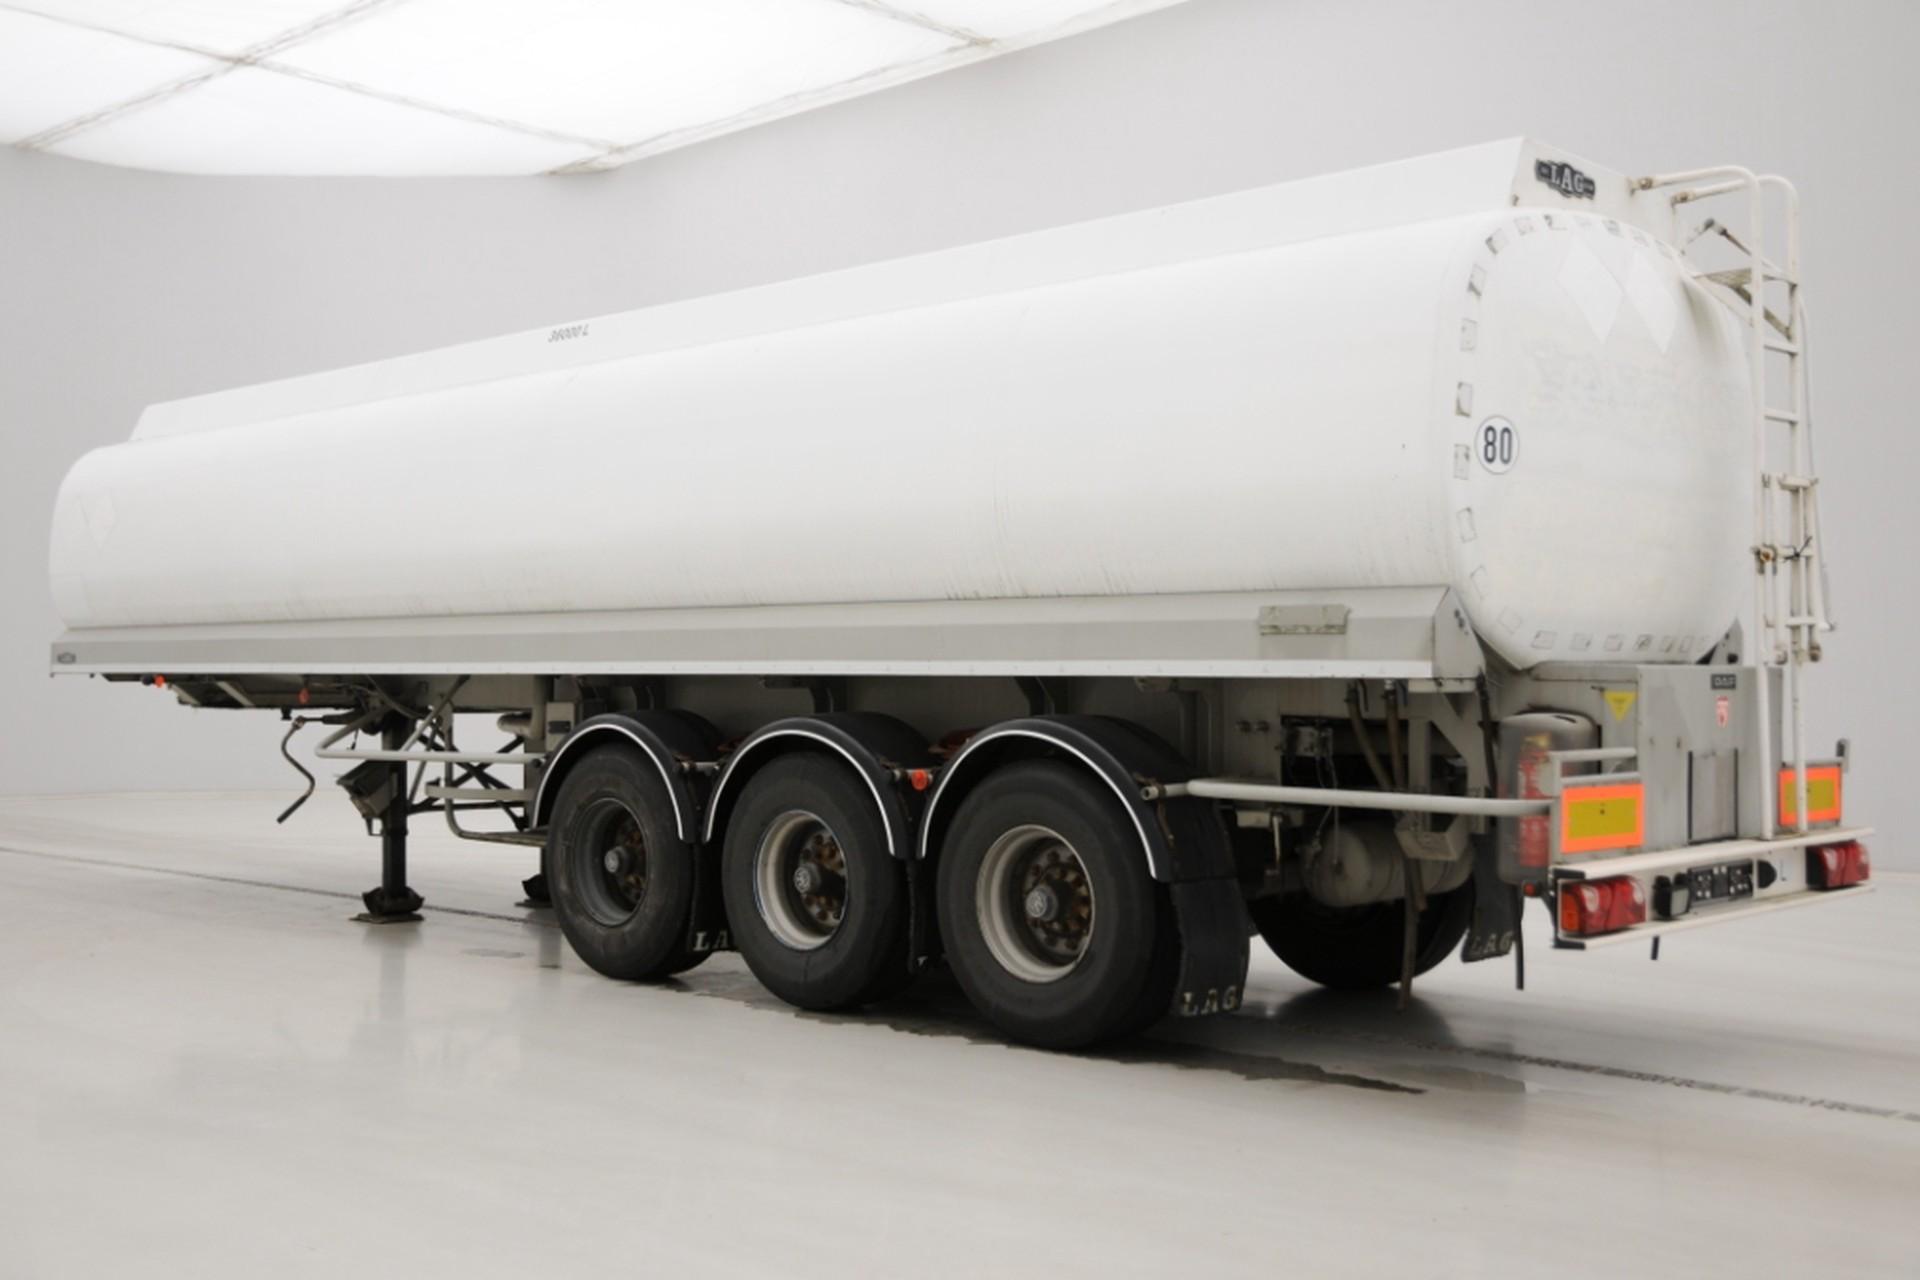 LAG Tank 36000 liter